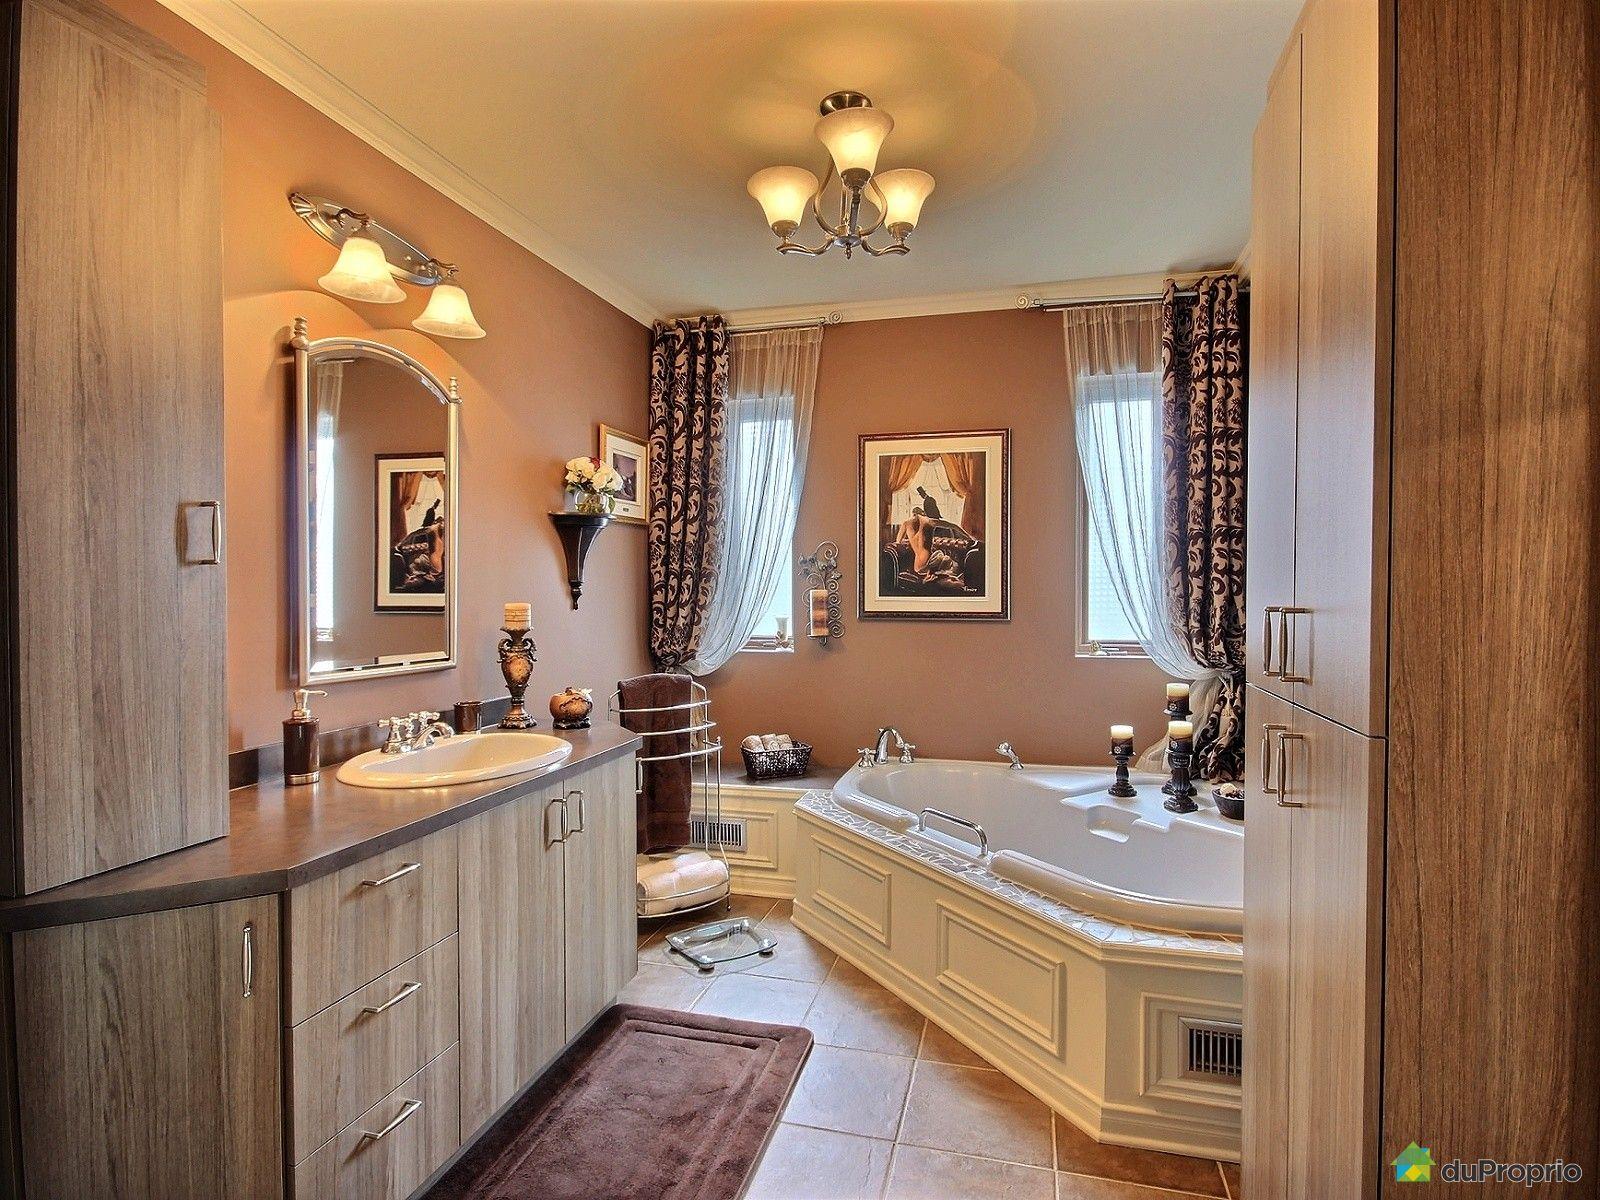 Maison vendre st eustache 425 rue mallette immobilier for Salle de bain 25 st eustache